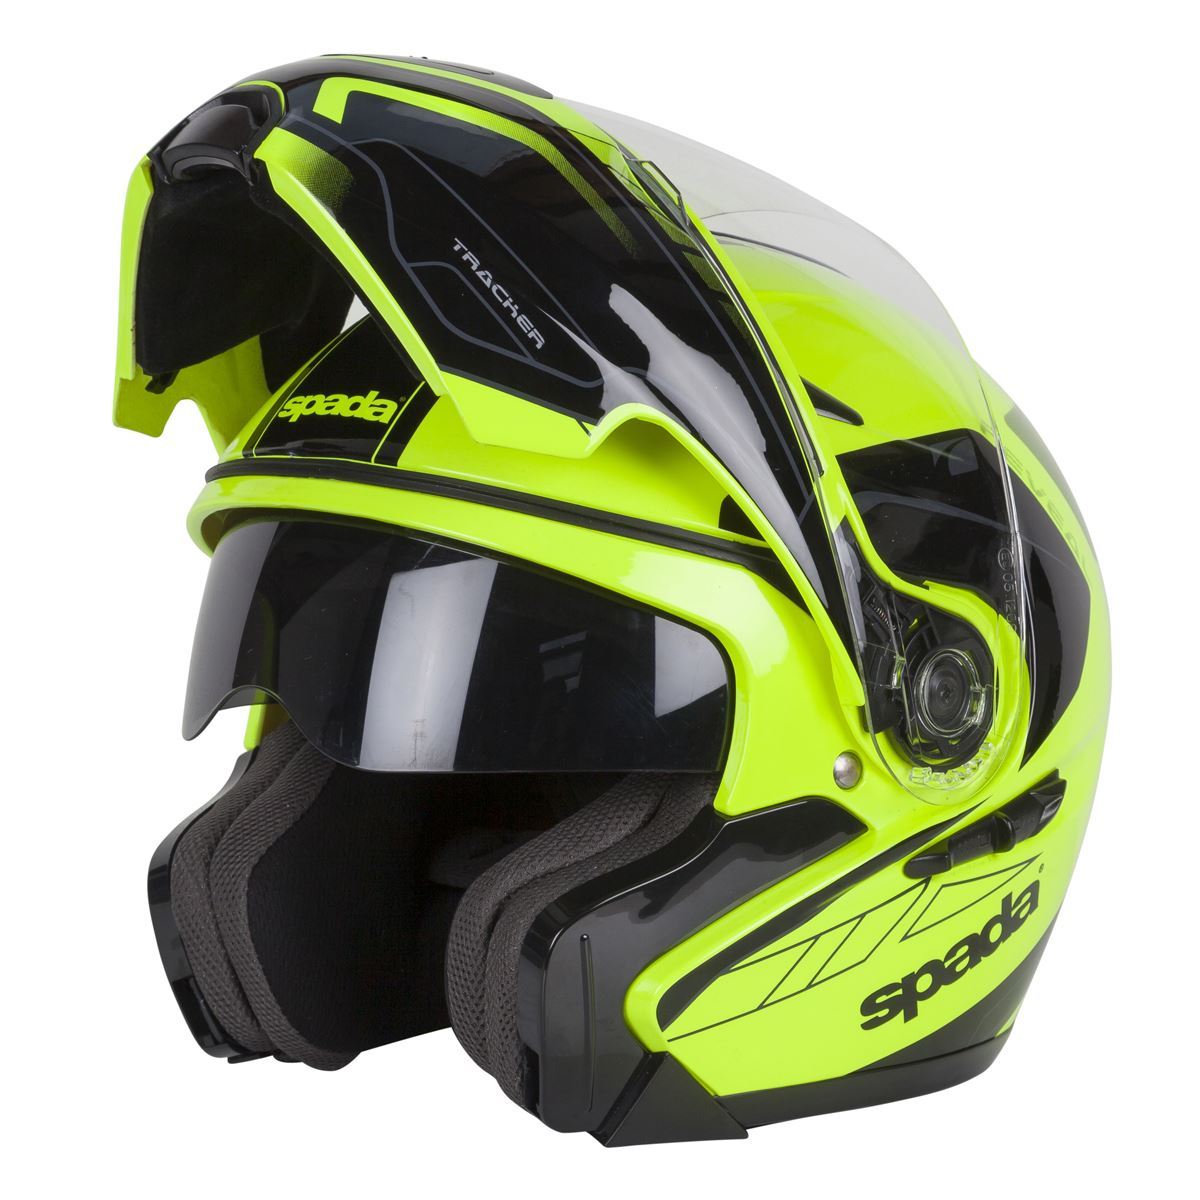 Spada-Reveal-Tracker-Casque-Moto-avant-Basculable-Jaune-Fluo-Noir miniature 11